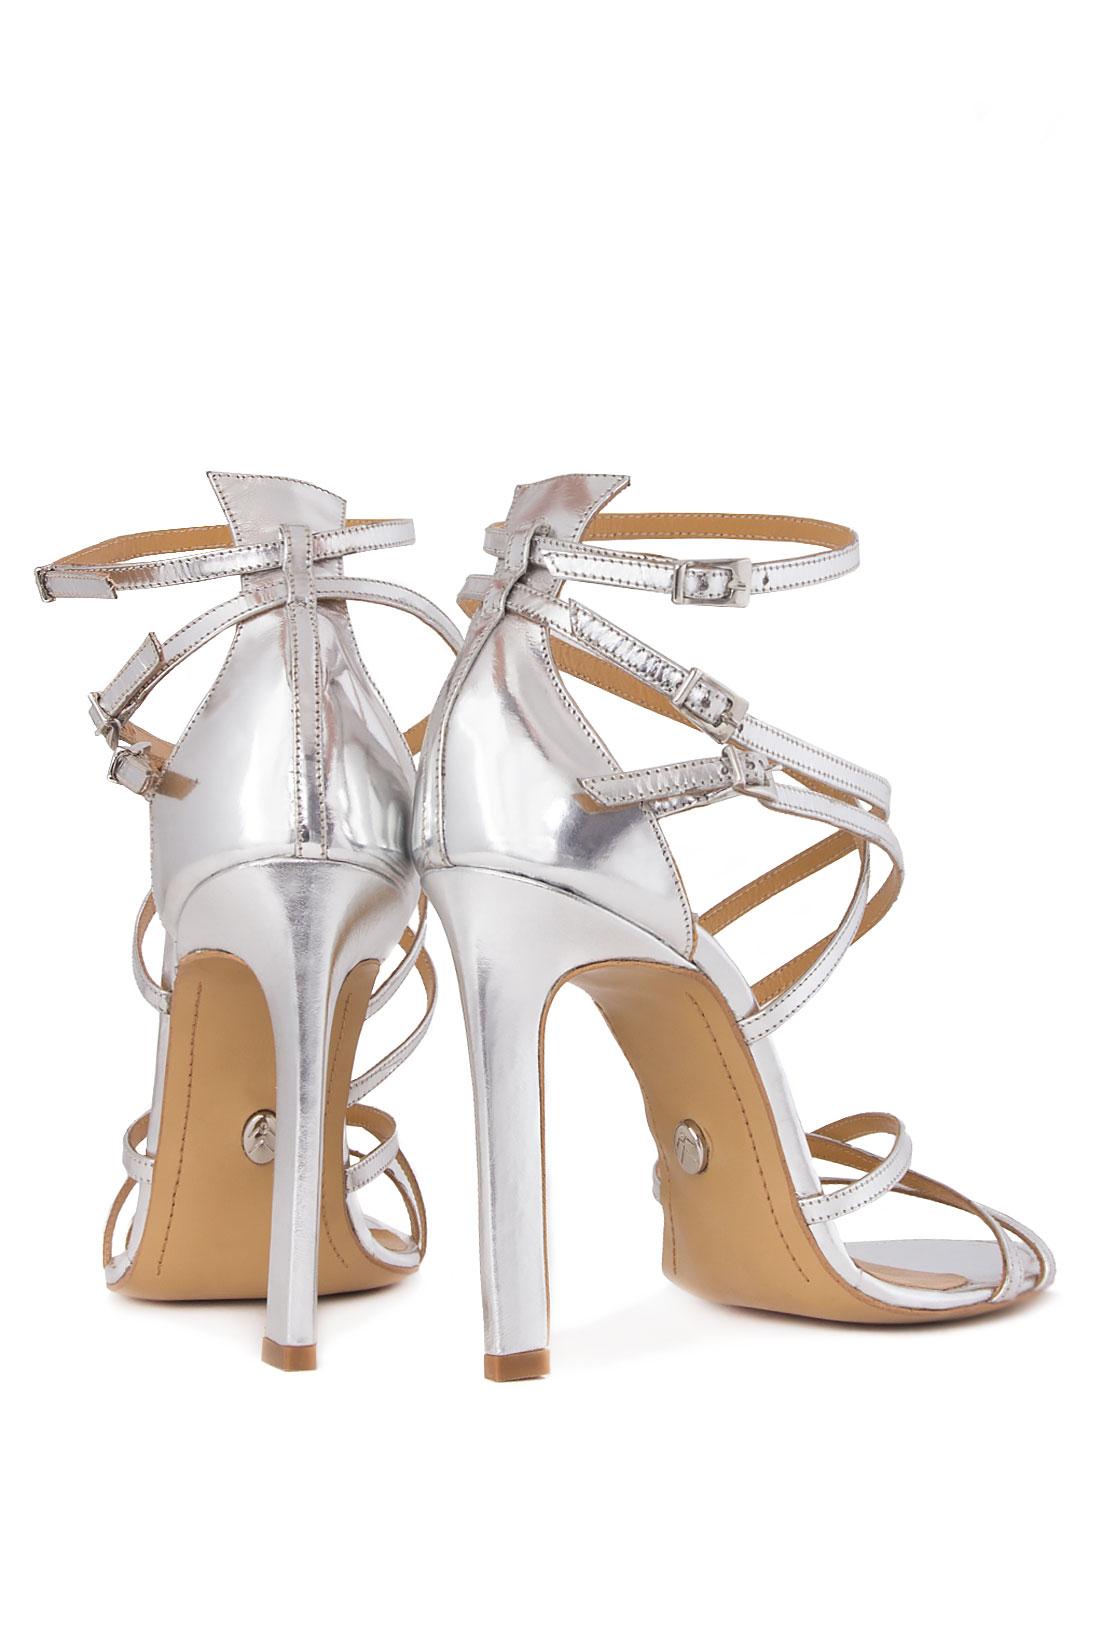 Sandale din piele metalizata Mihai Albu imagine 2